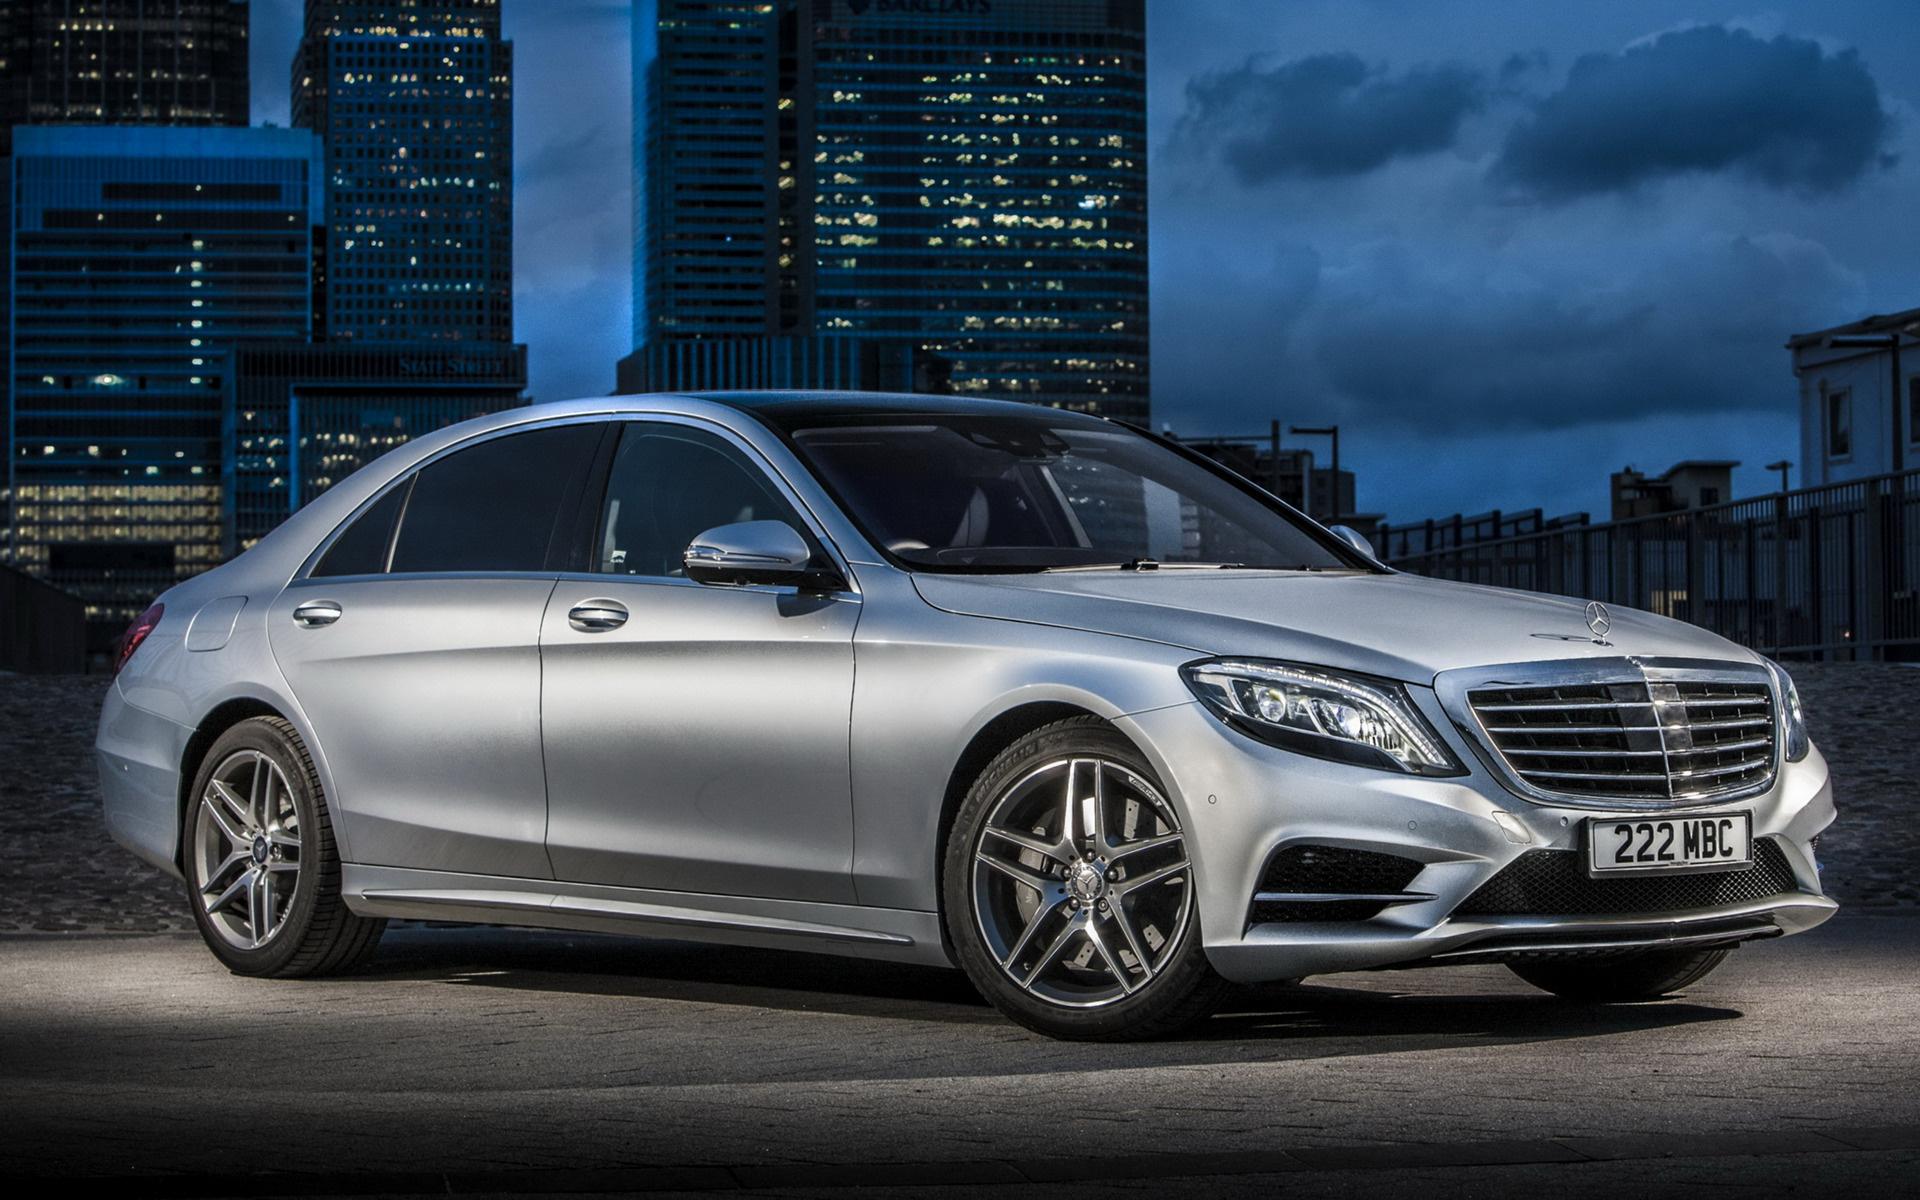 мерседес серебристый Mercedes silver без смс